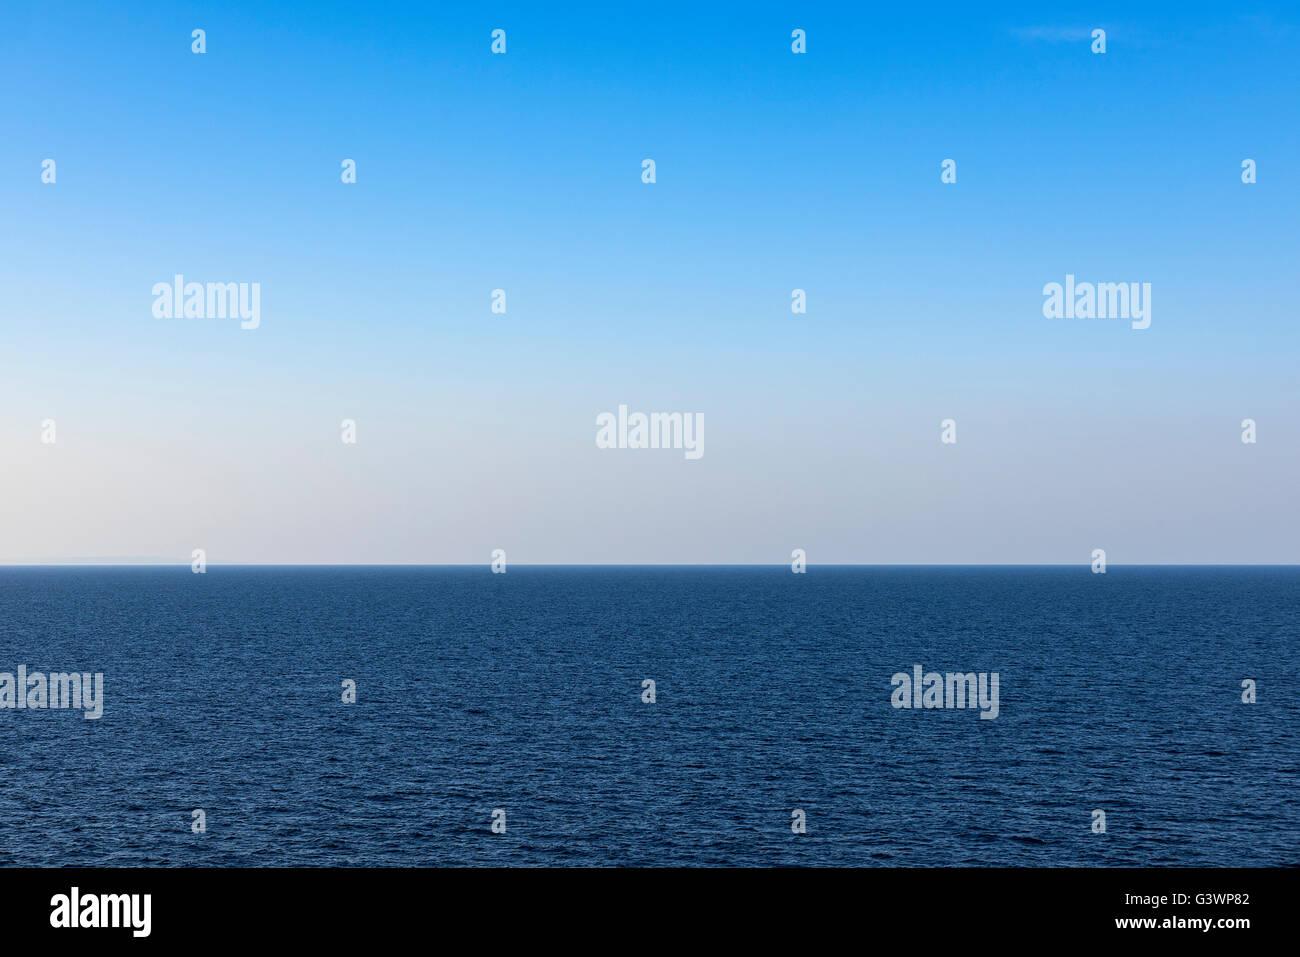 Sea and sky horizon. - Stock Image